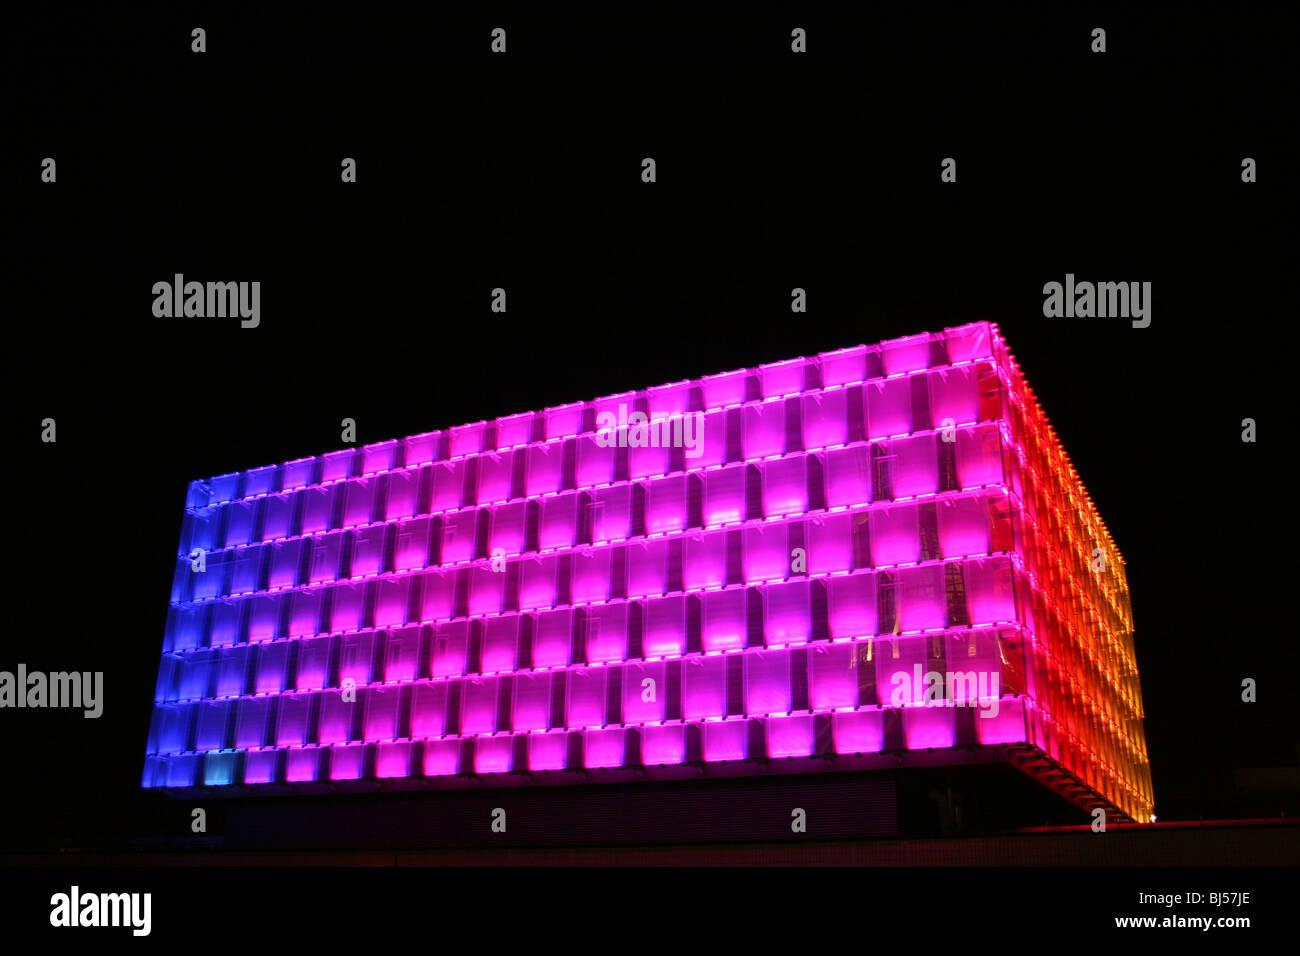 The Engineering Building At Night, Liverpool University, Merseyside, UK - Stock Image